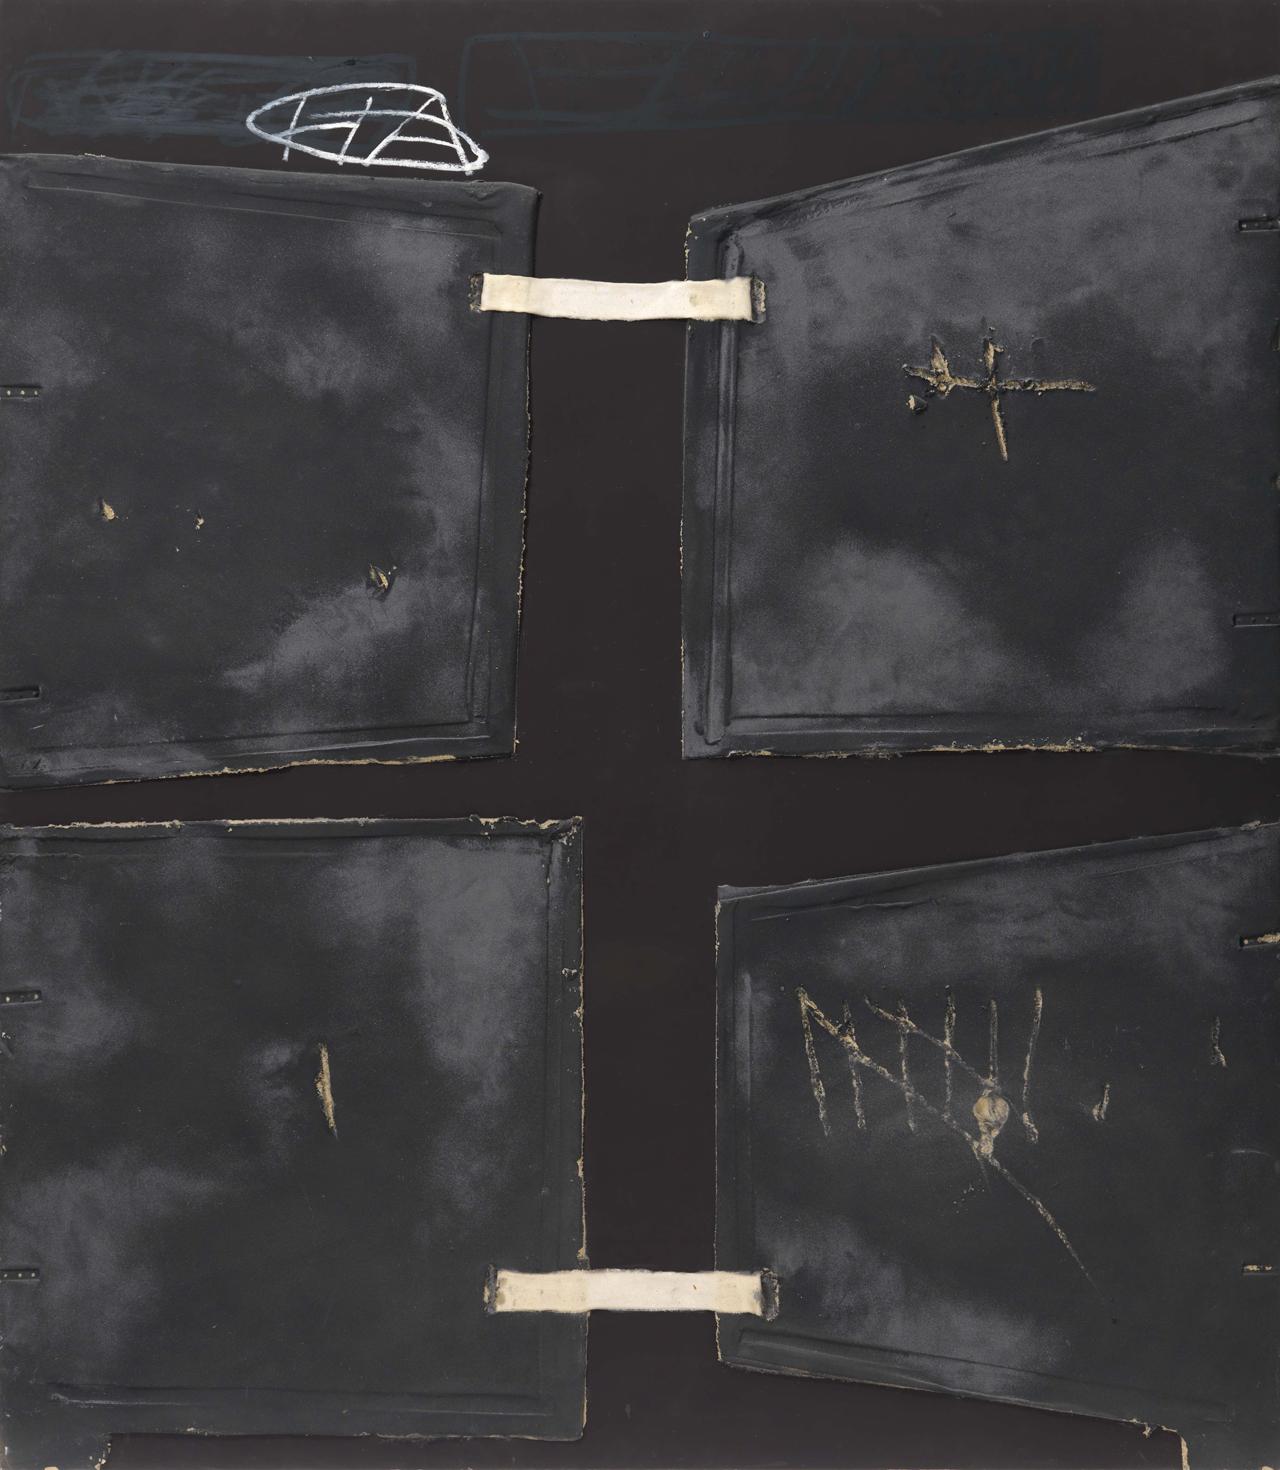 Antoni Tàpies, Quatre formes, 1995, Farbe, Marmorstaub und Collage auf Holz, 200 x 175 cm